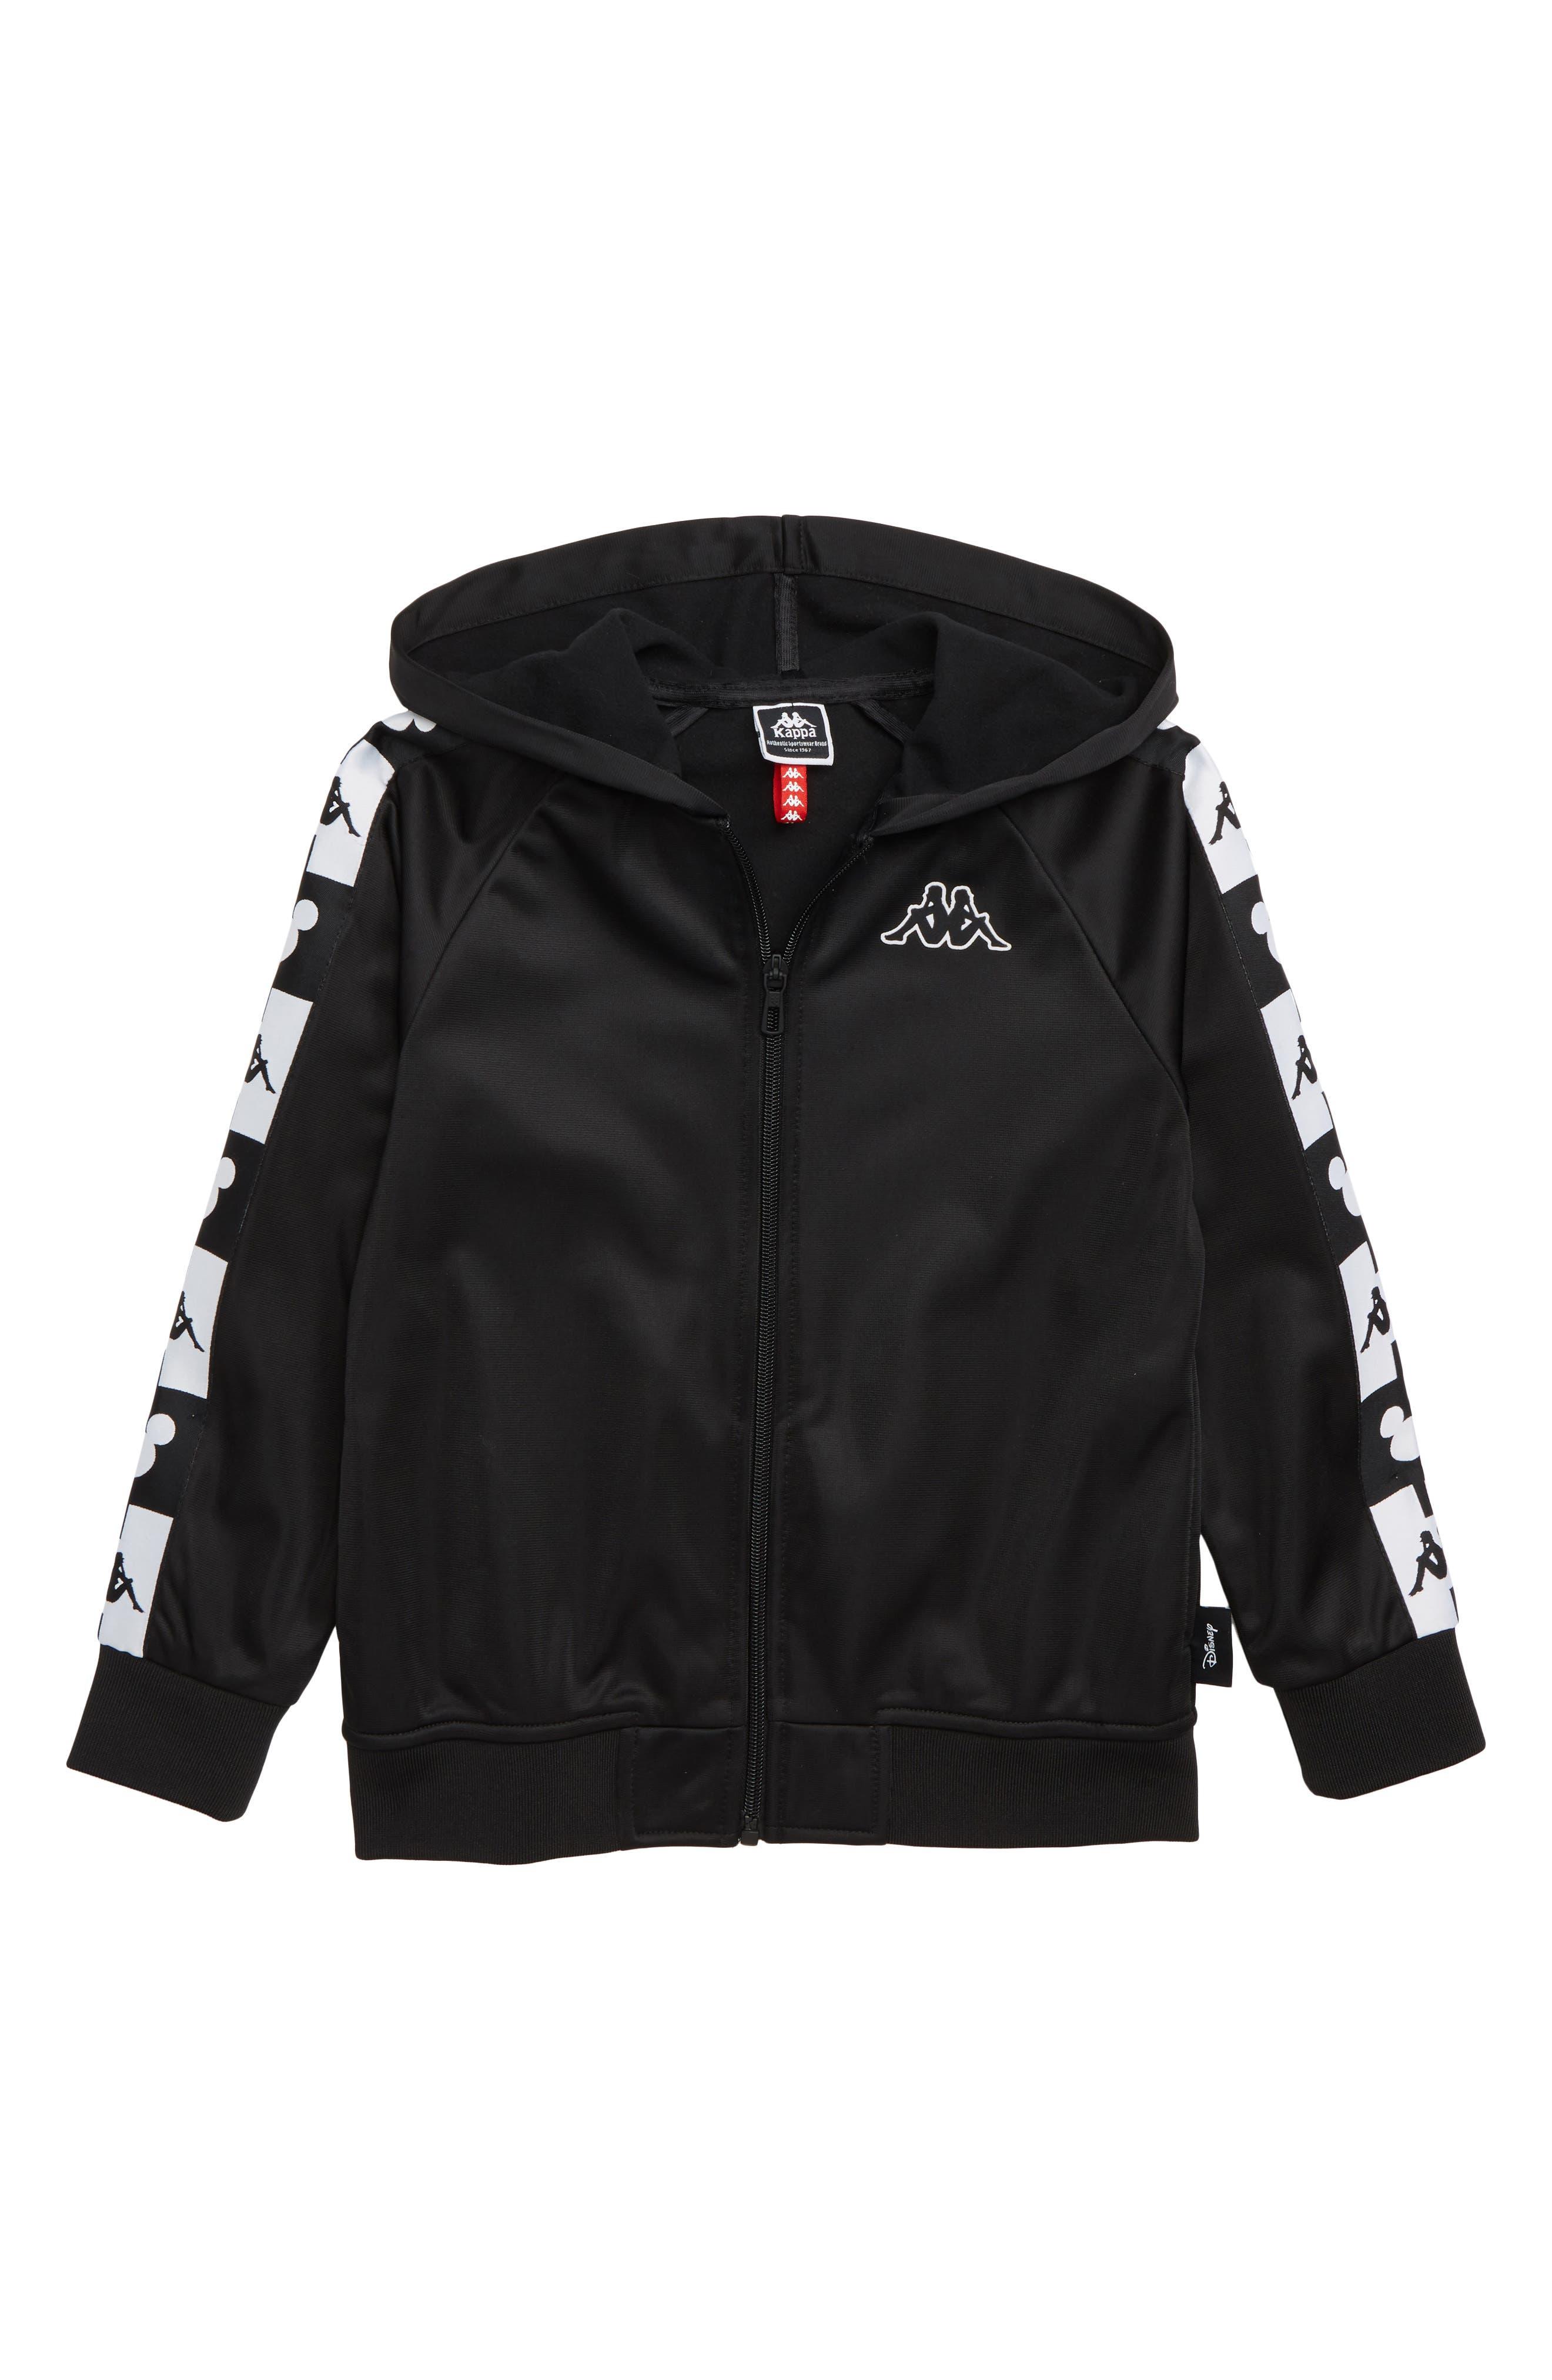 x Disney<sup>®</sup> Authentic Ander Full Zip Hoodie,                         Main,                         color, BLACK